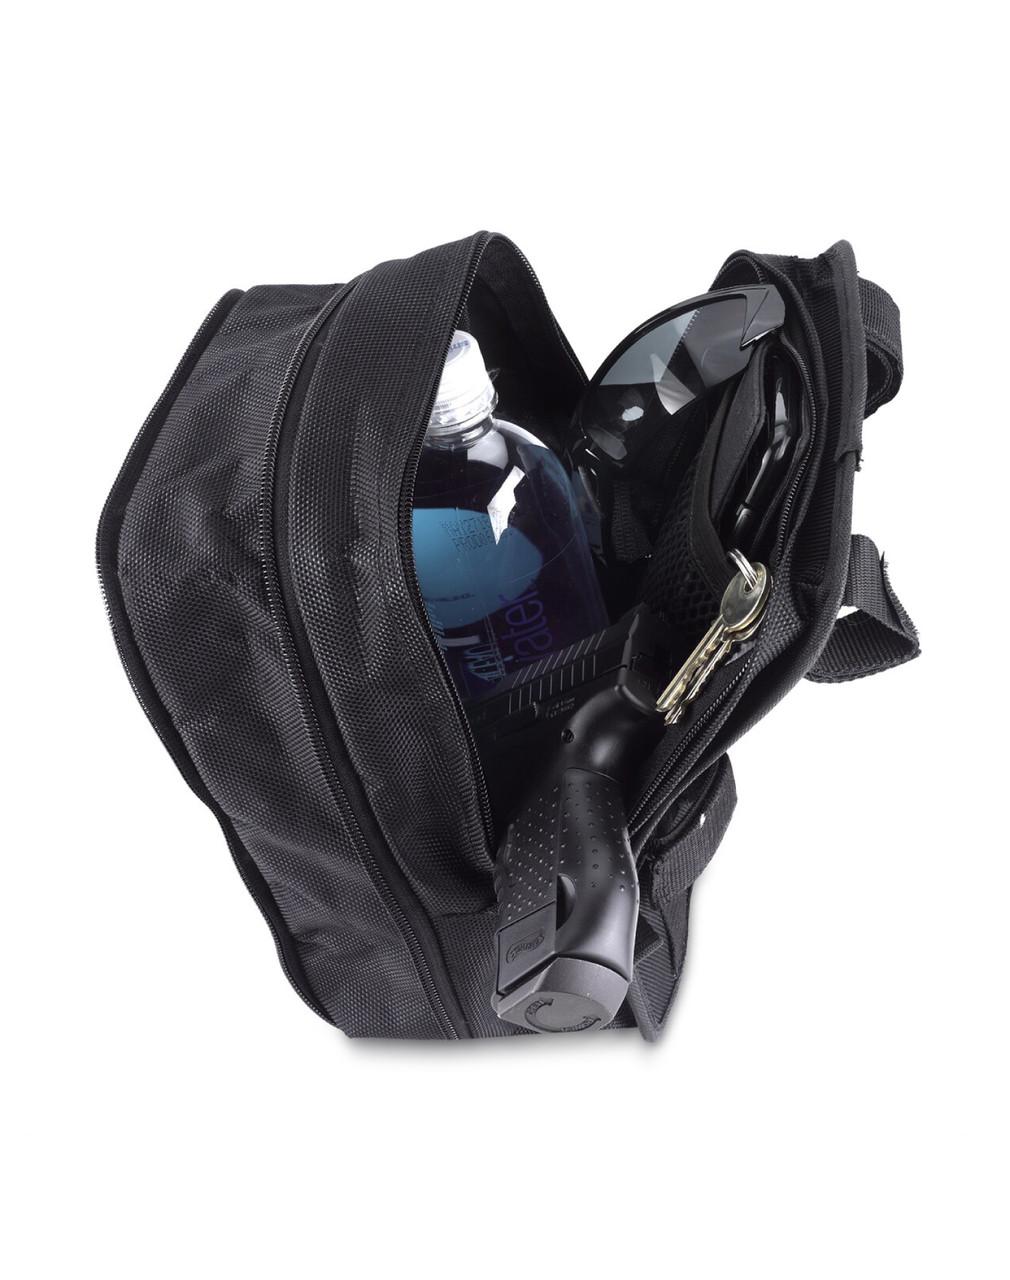 Honda Viking Tall T-Bar Bag Carrying Items View